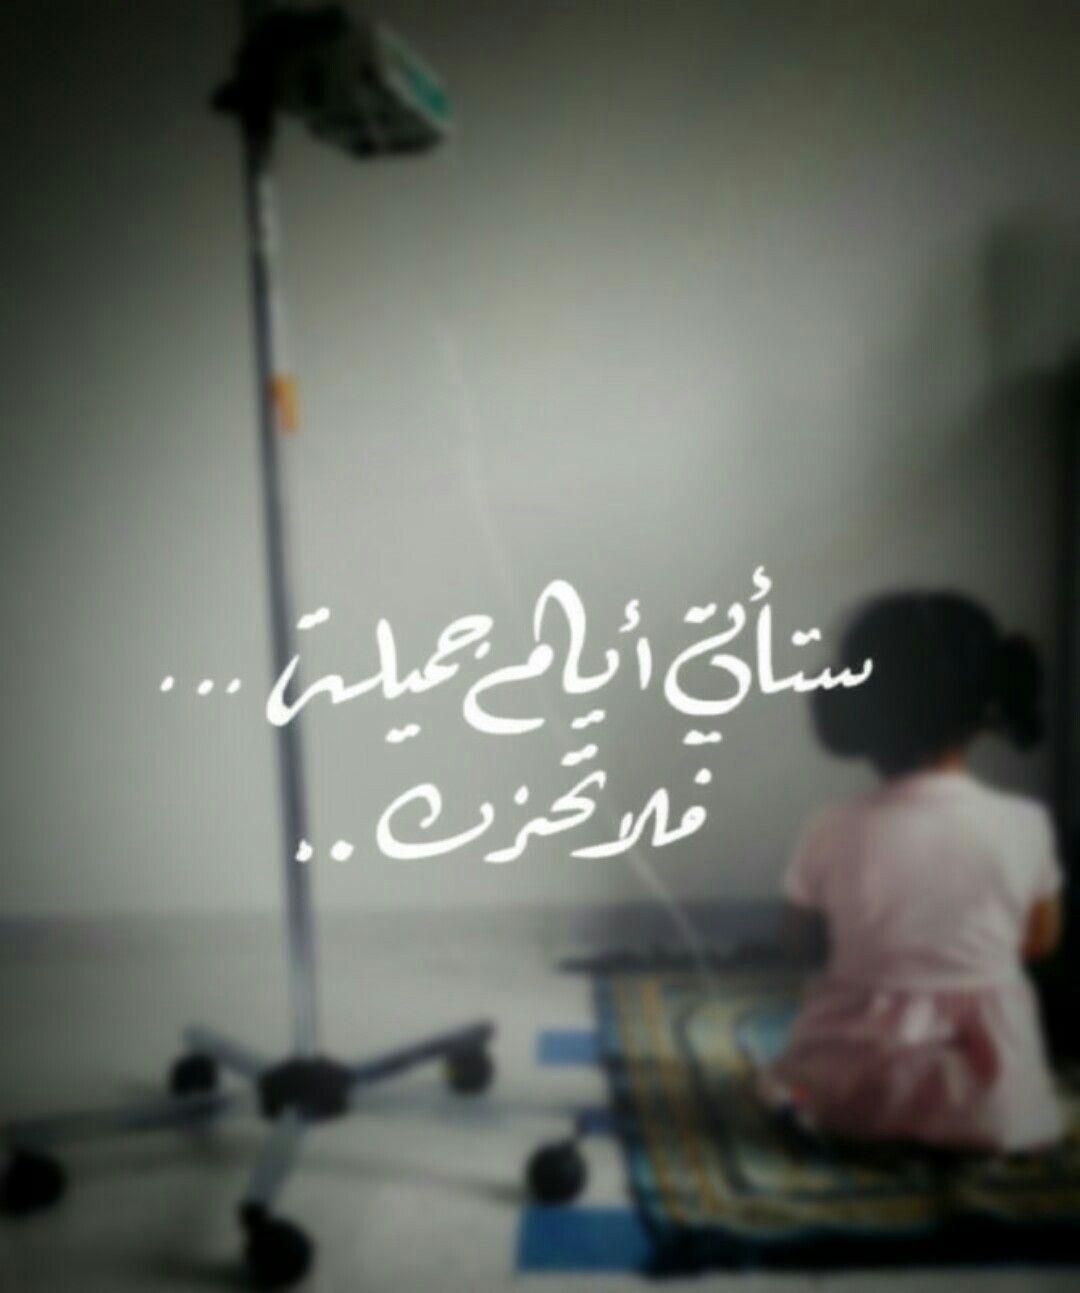 ستأتي أيام جميلة Morning Quotes Quotes Arabic Calligraphy